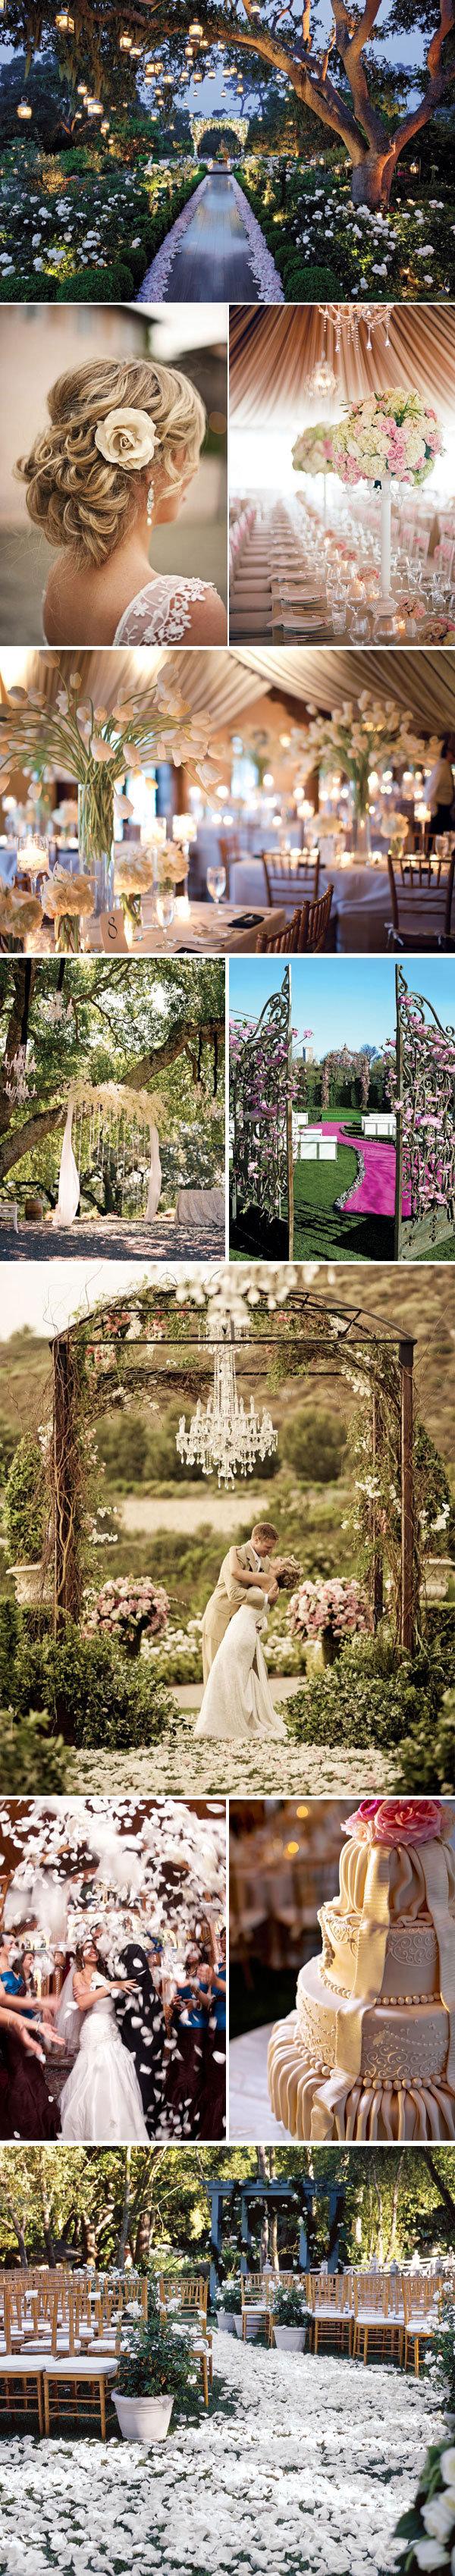 romantic wedding style